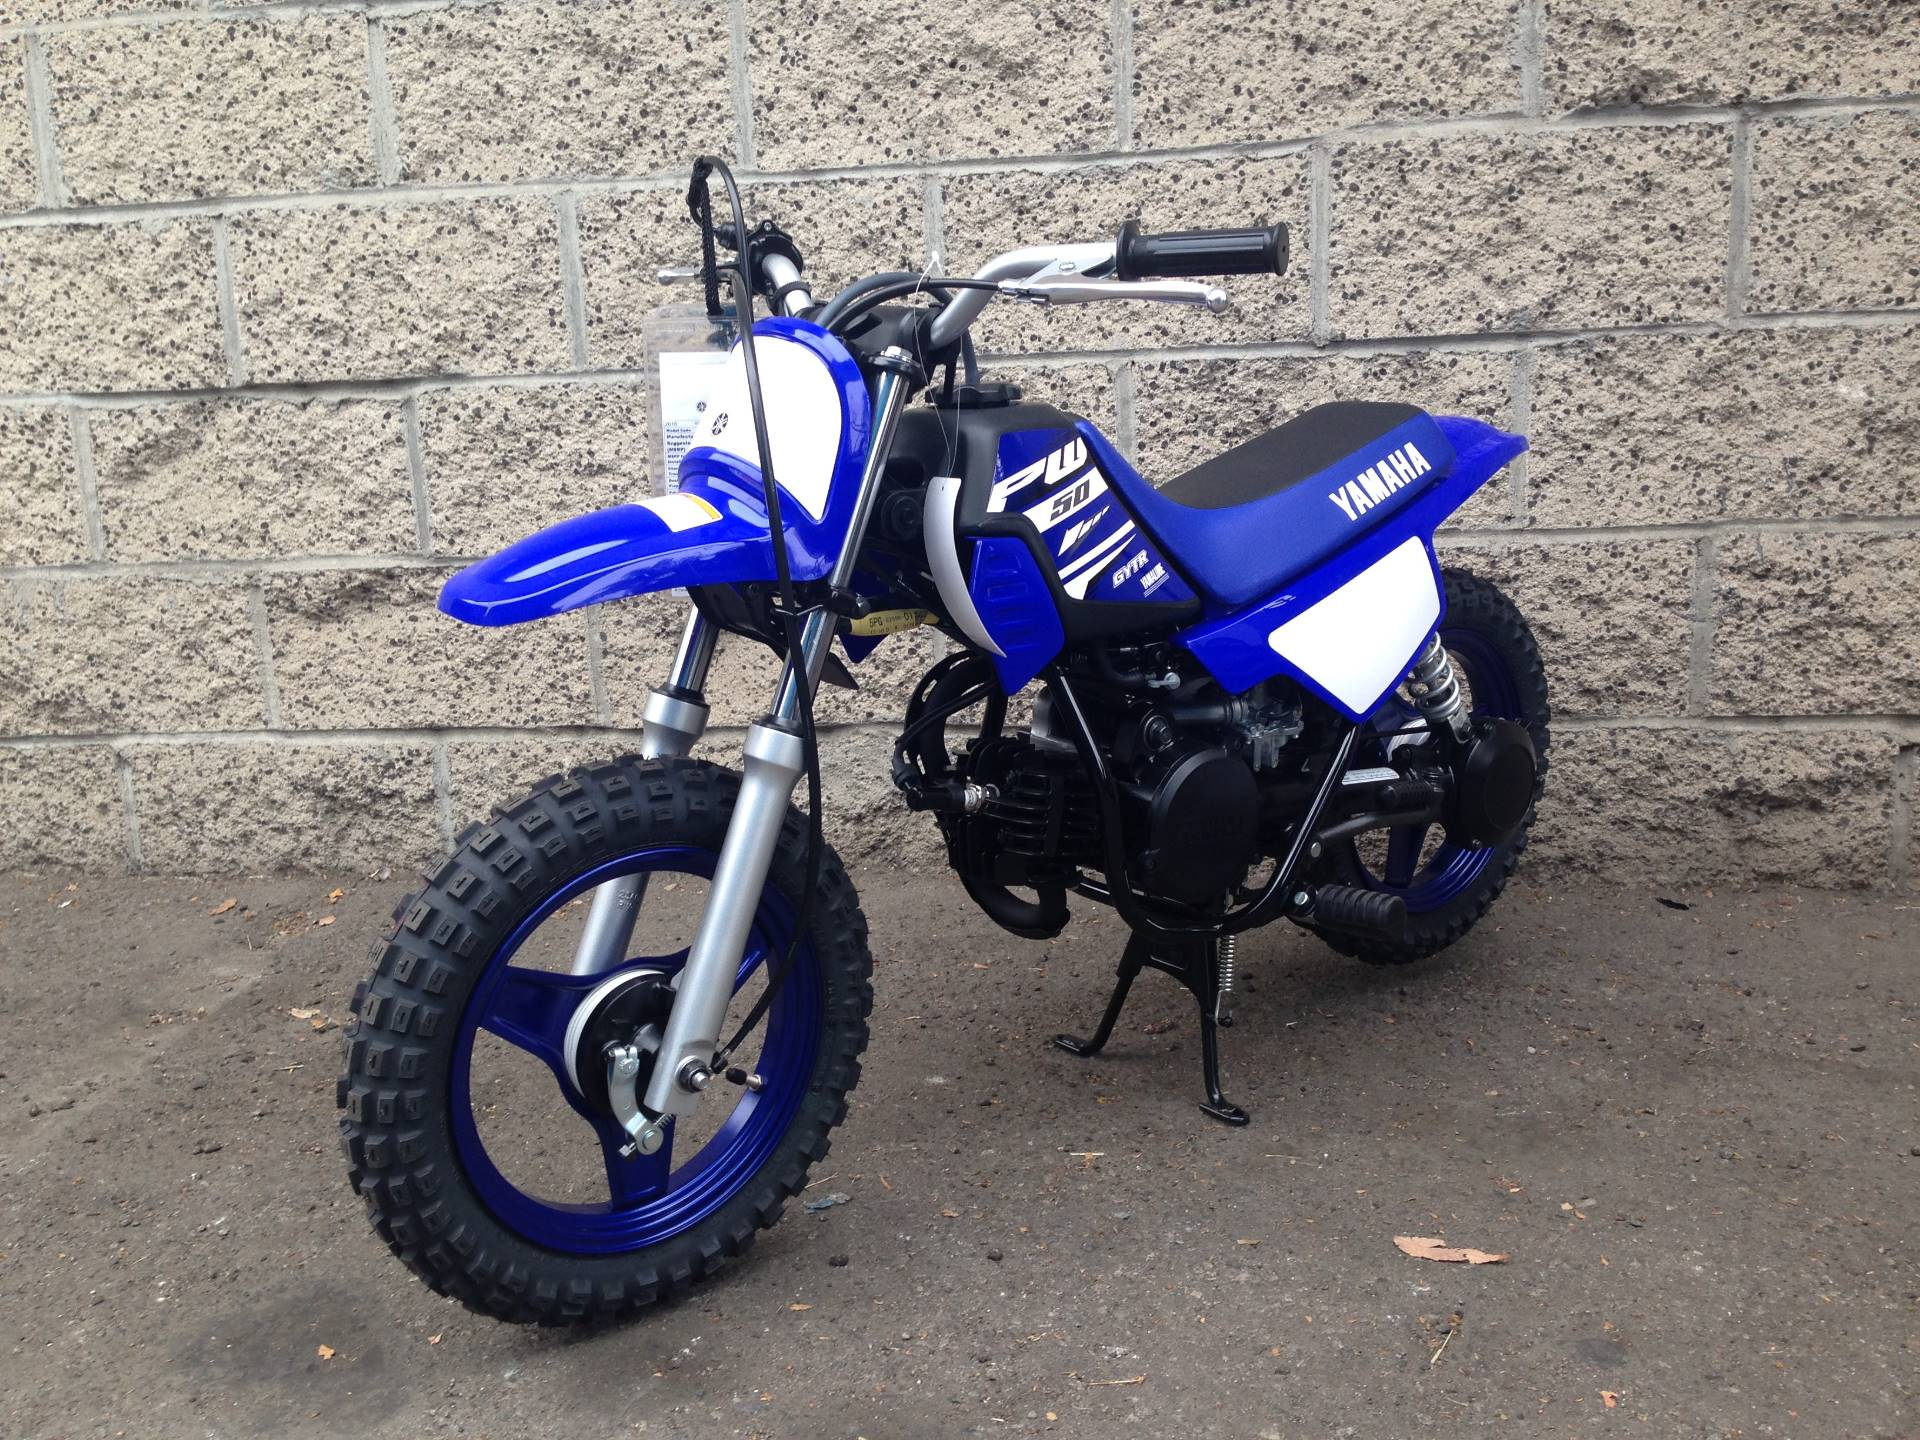 2018 Yamaha PW50 for sale 97802